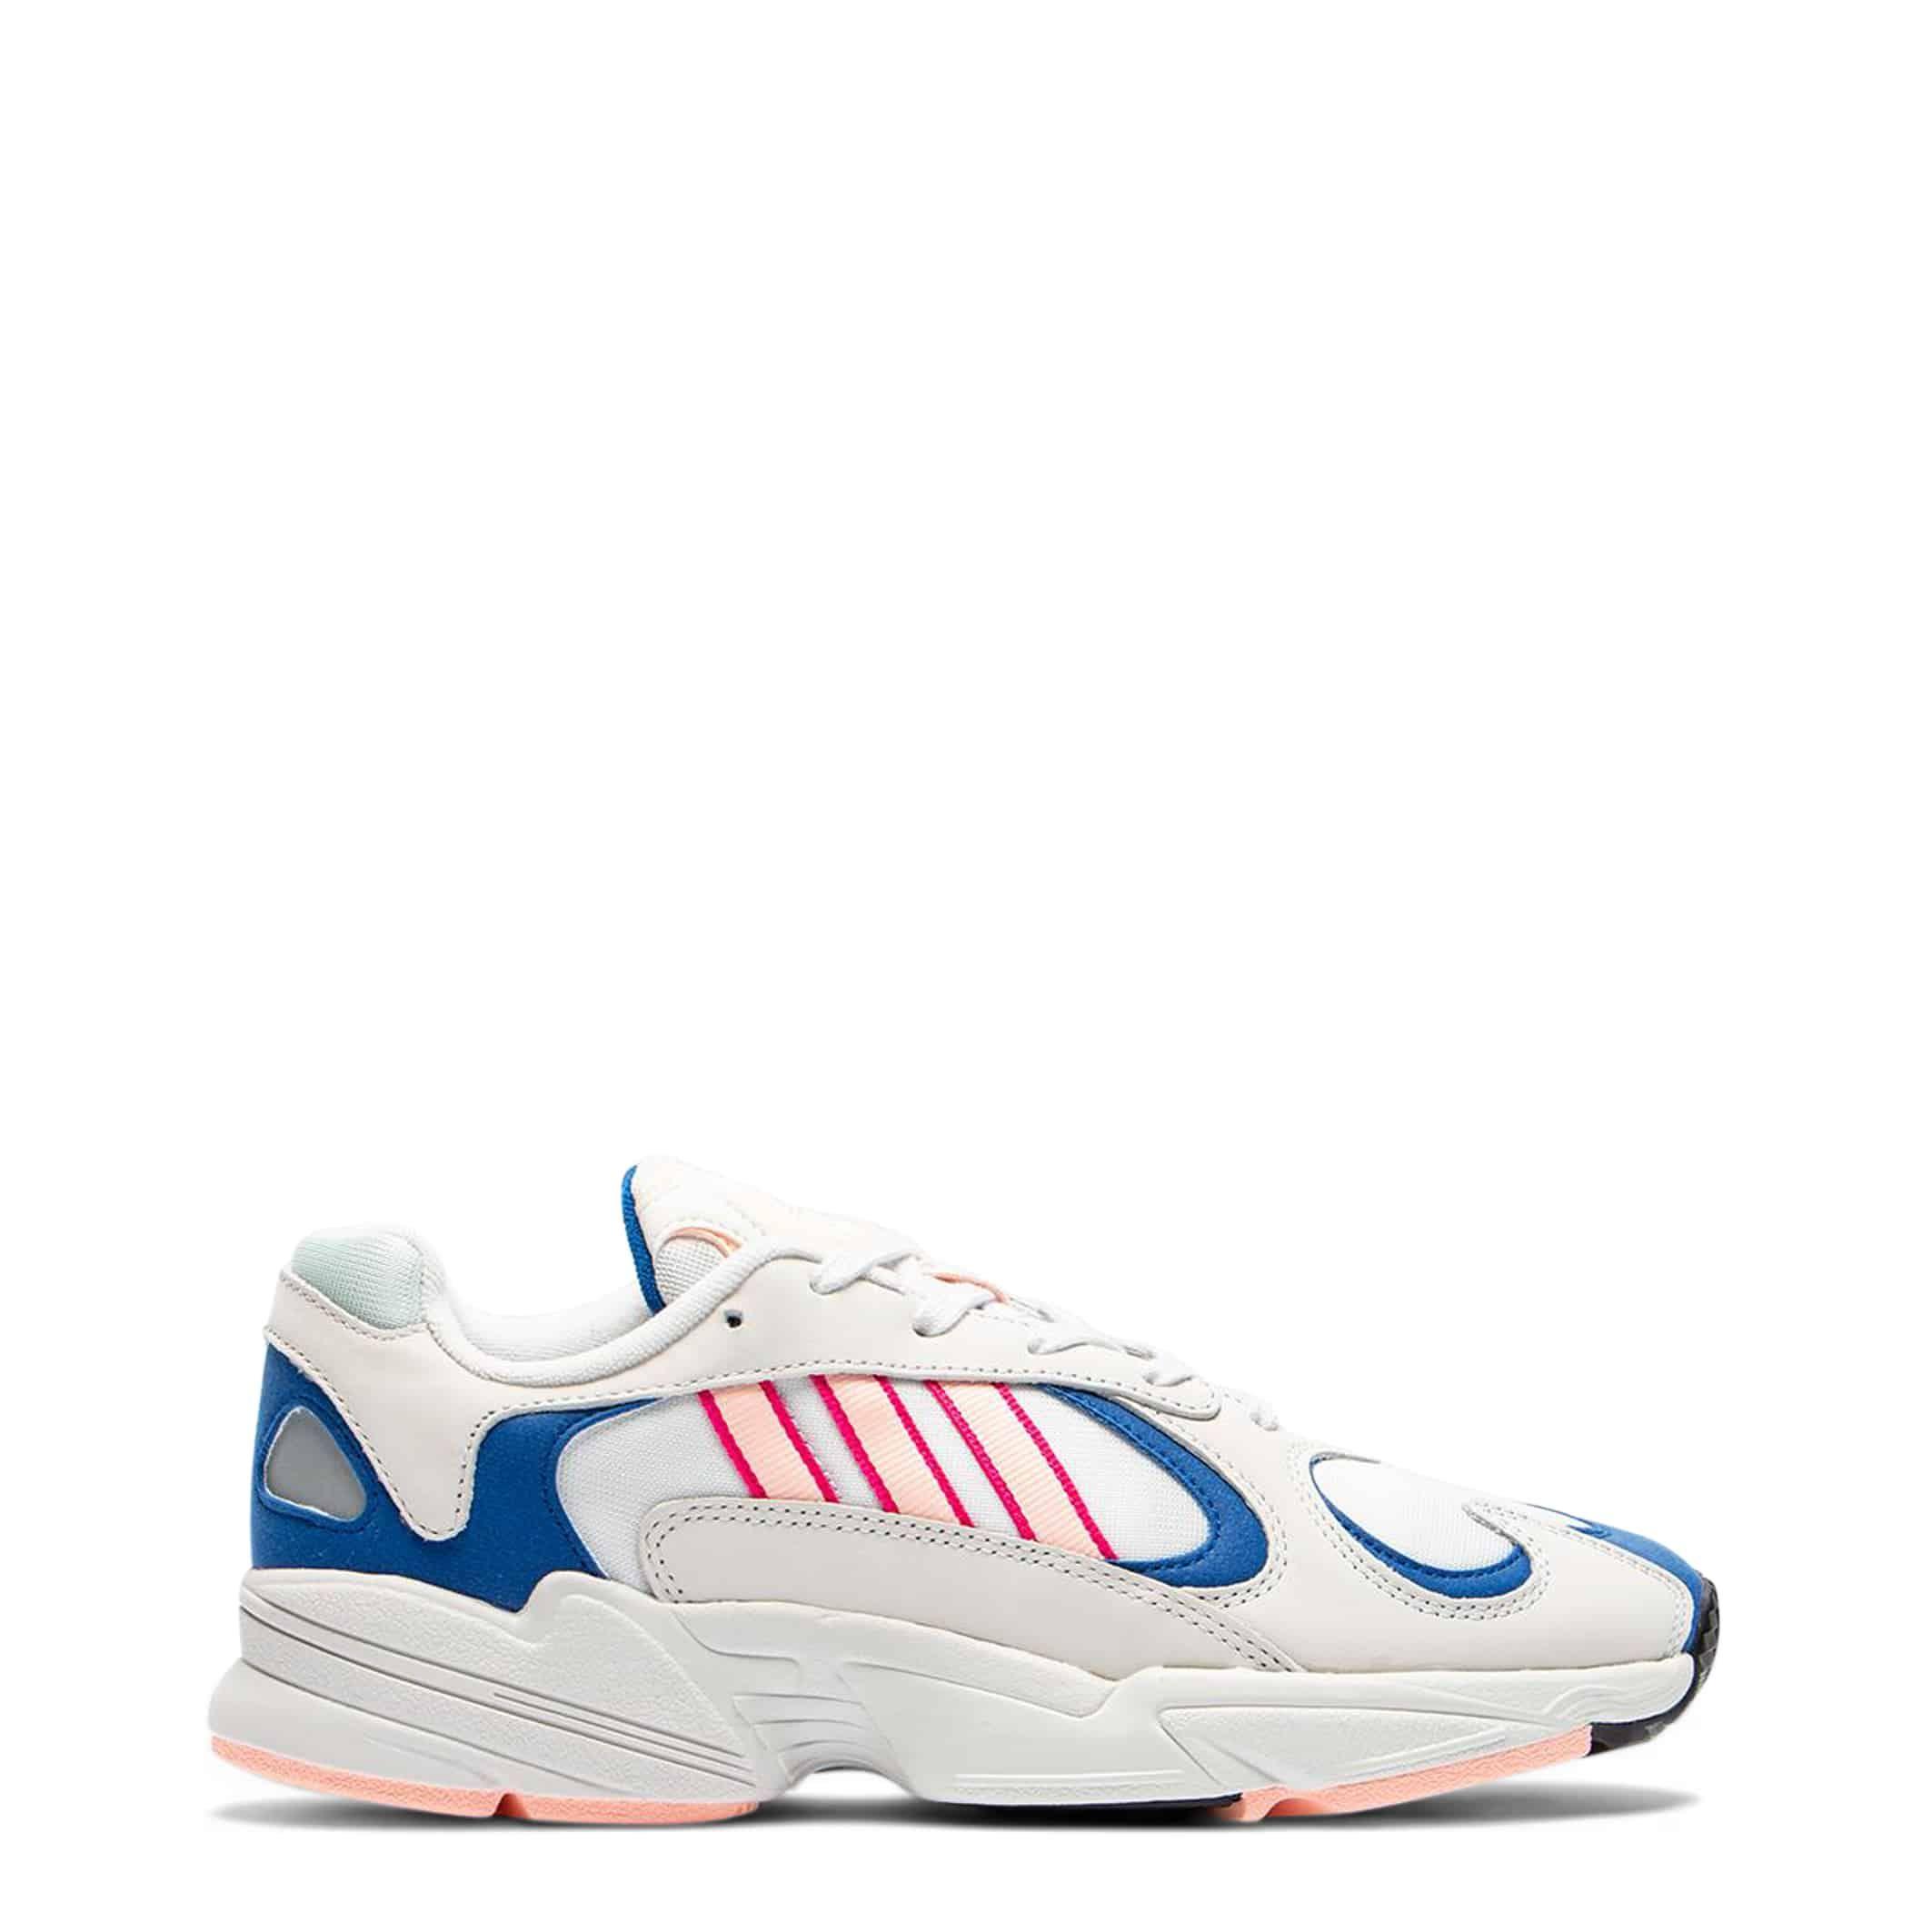 Schuhe Adidas – YUNG-1 – Weiß